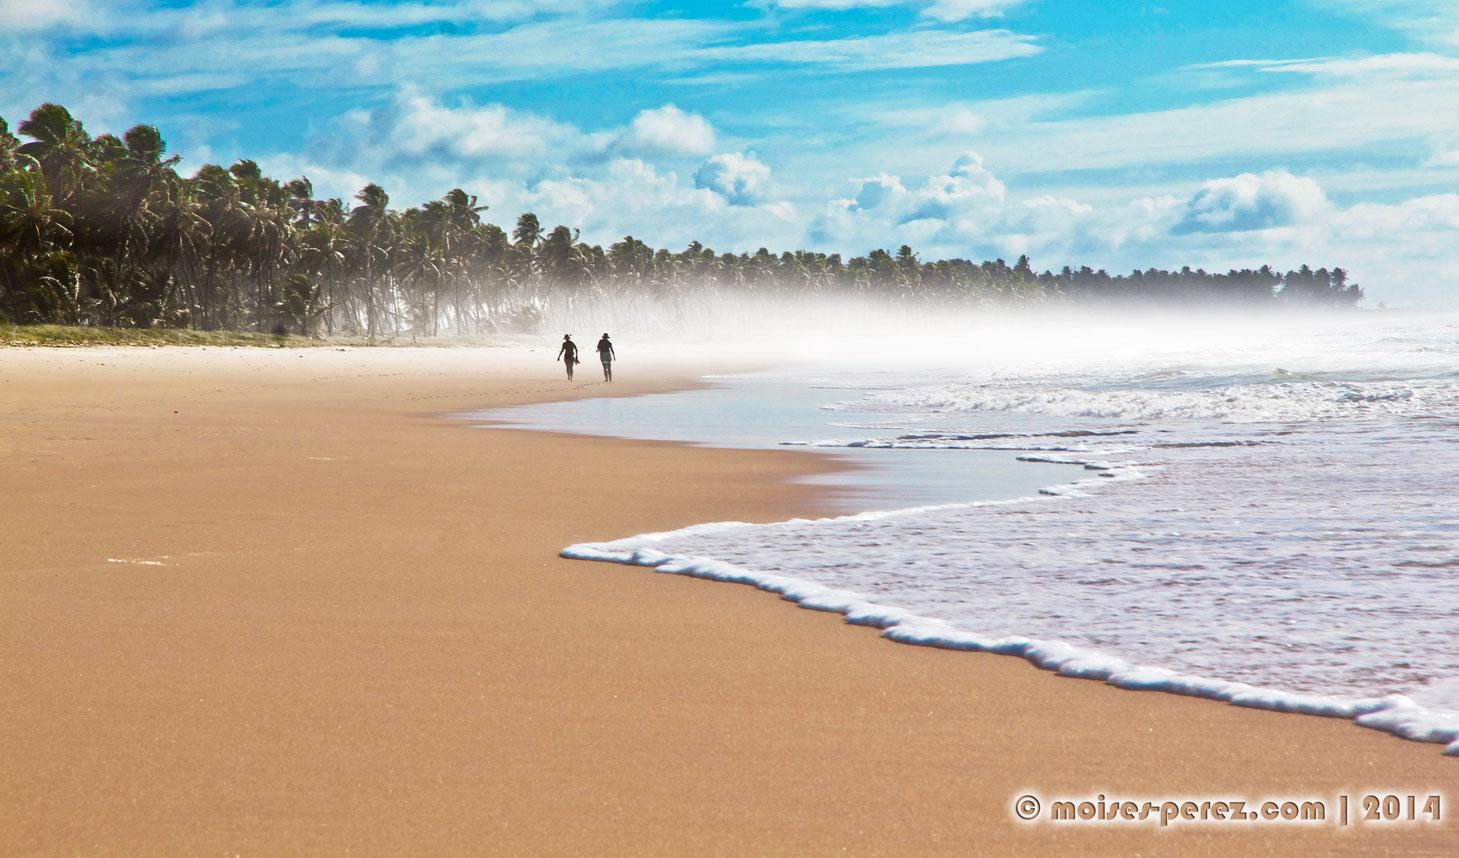 Paradise beach in Praia do Forte